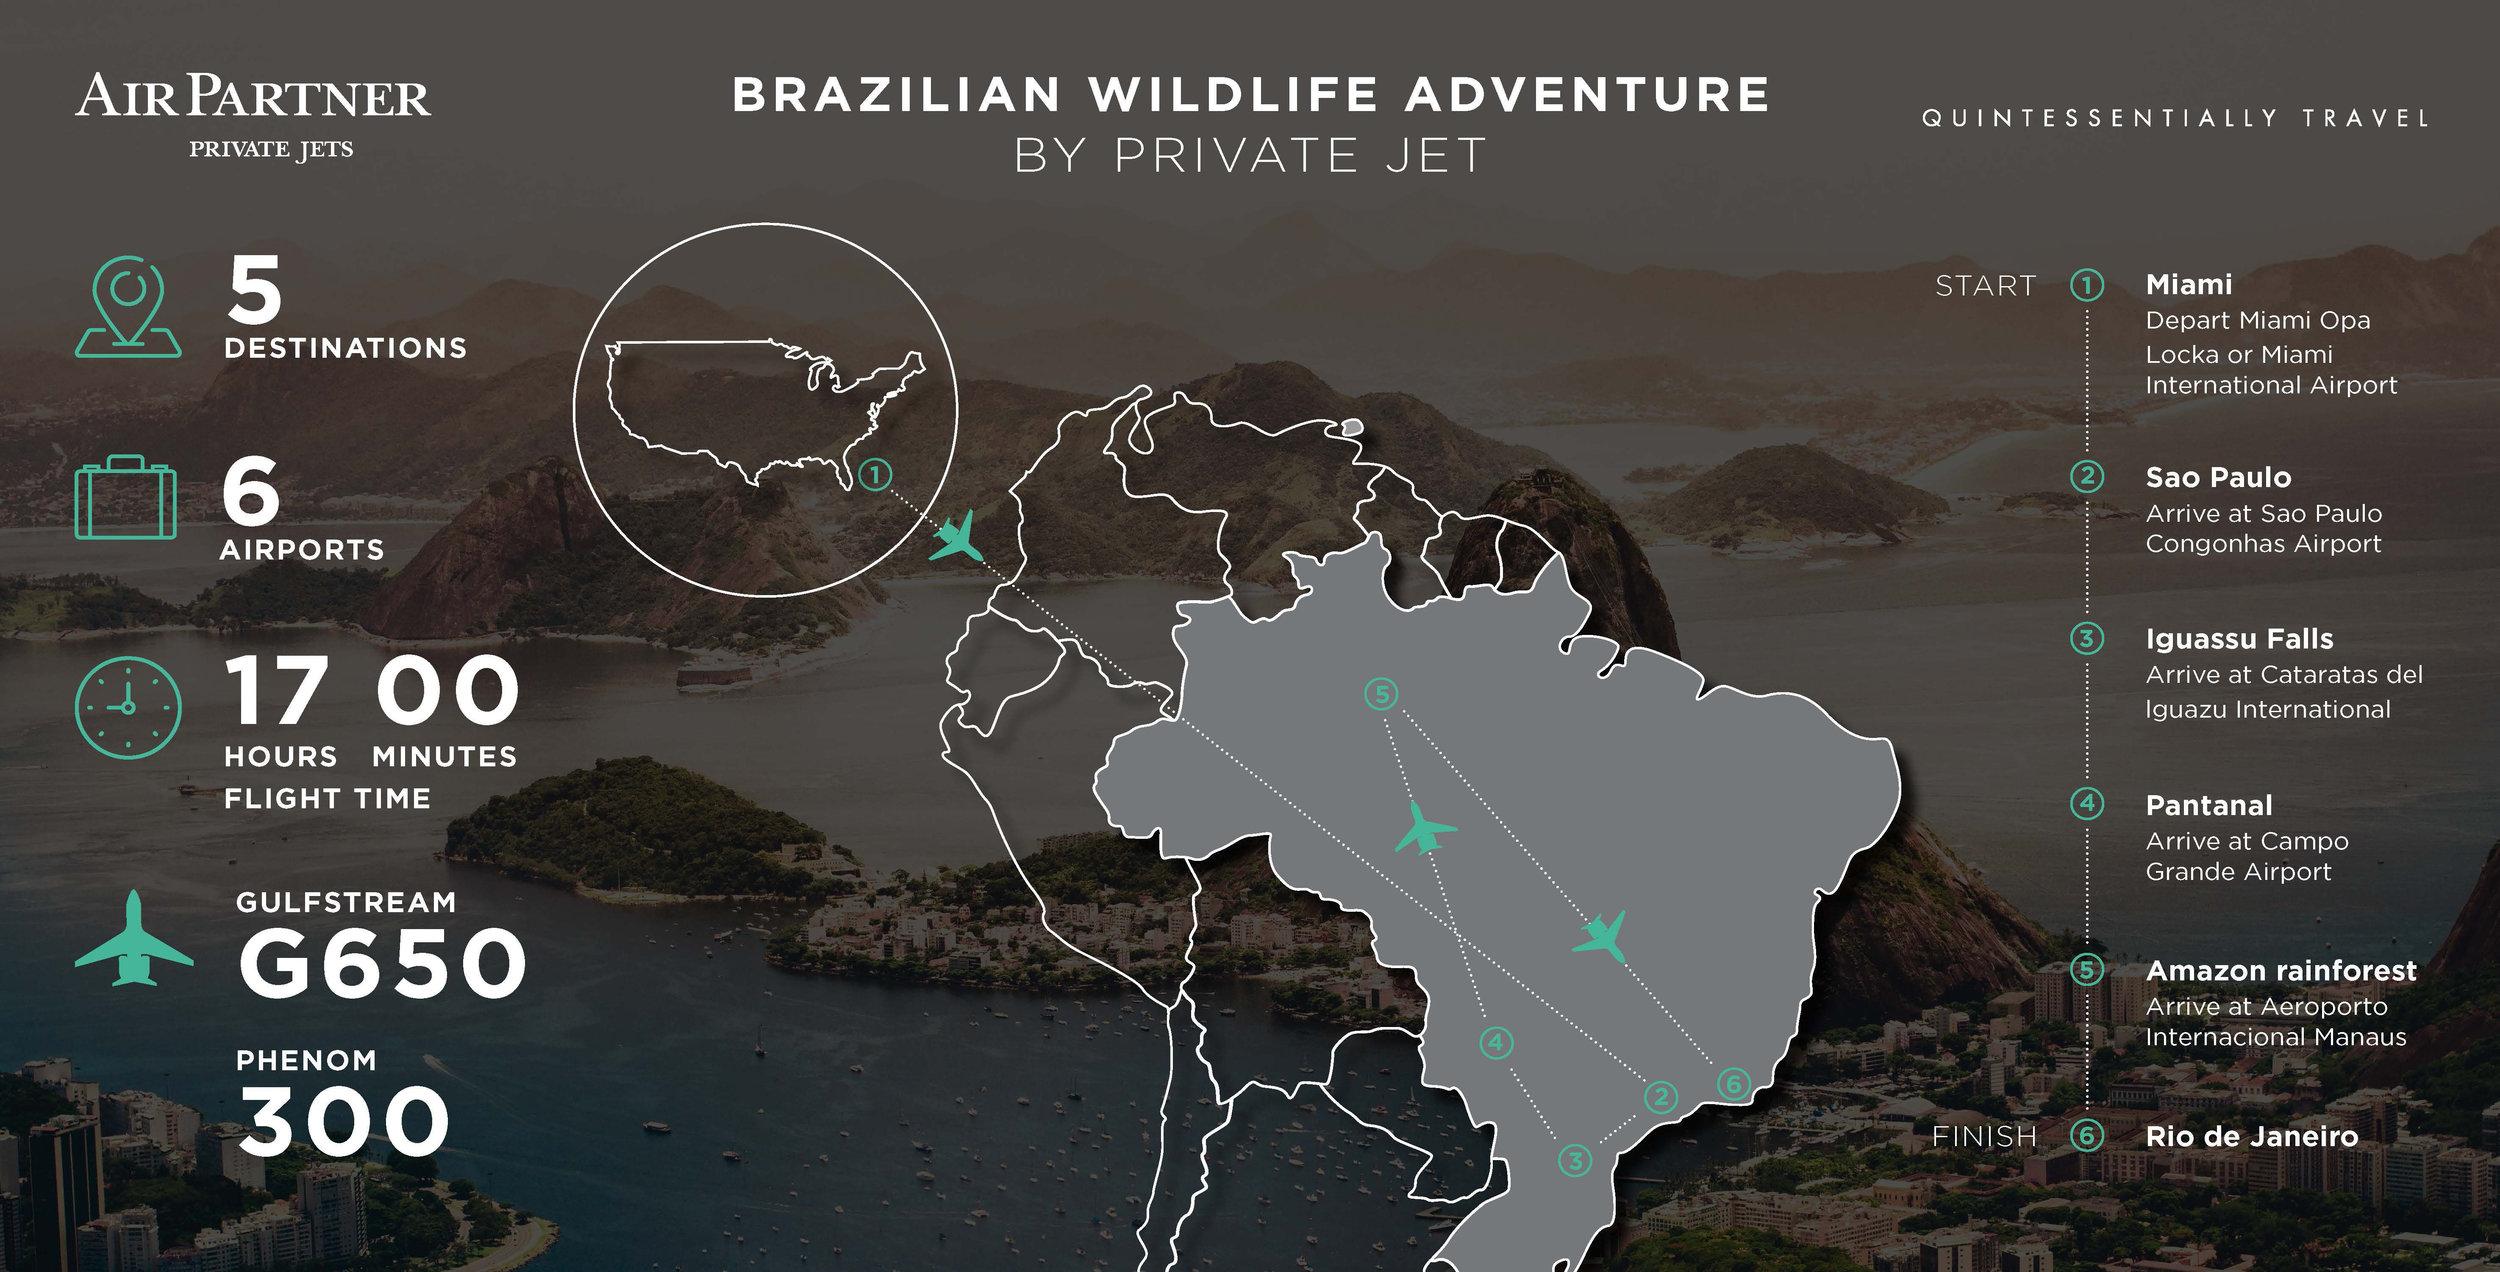 Brazil Wildlife Adventure by private jet using jet card membership